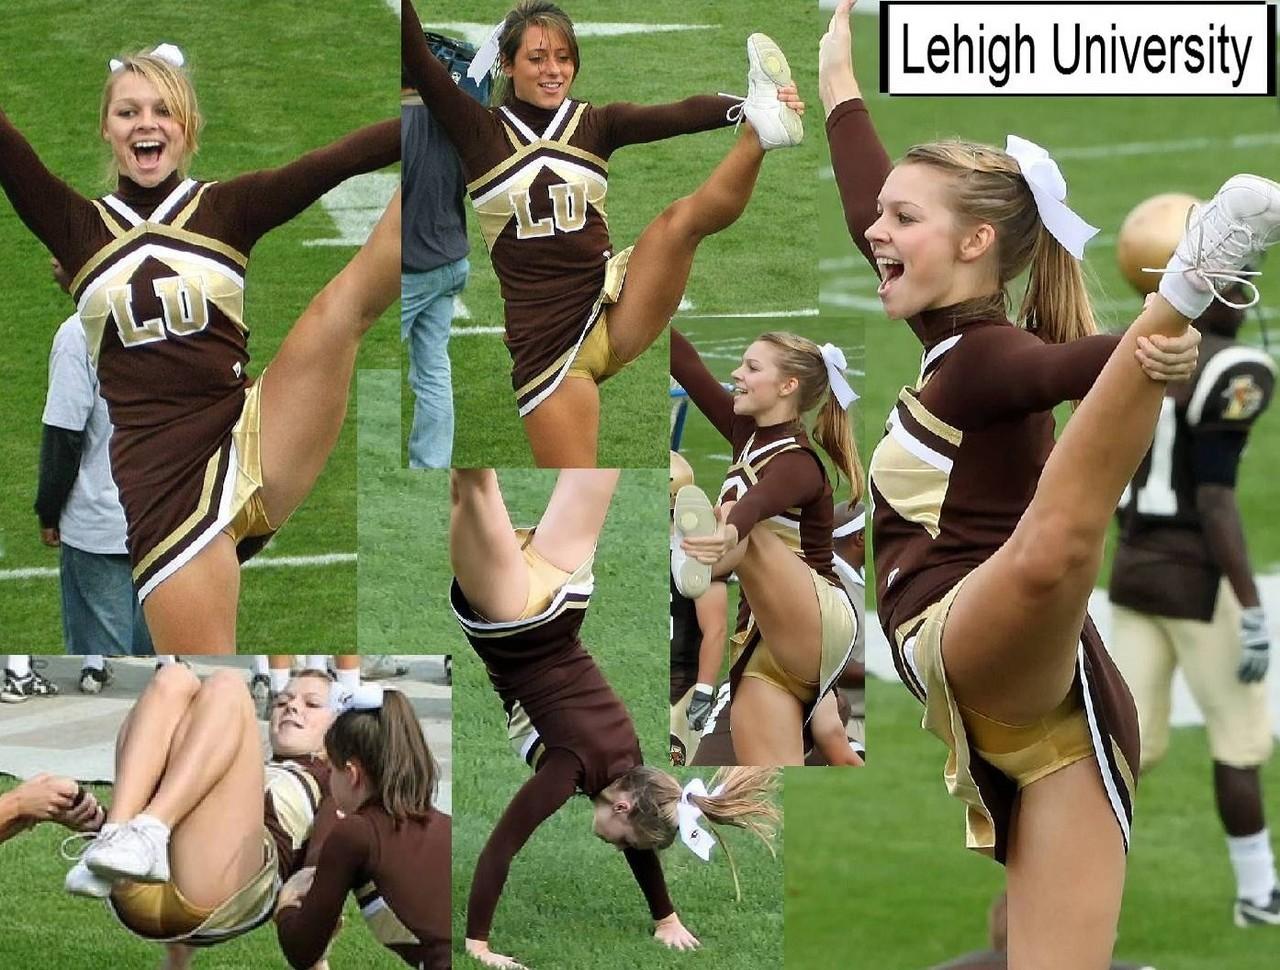 Alabama Cheerleaders Naked photo 7